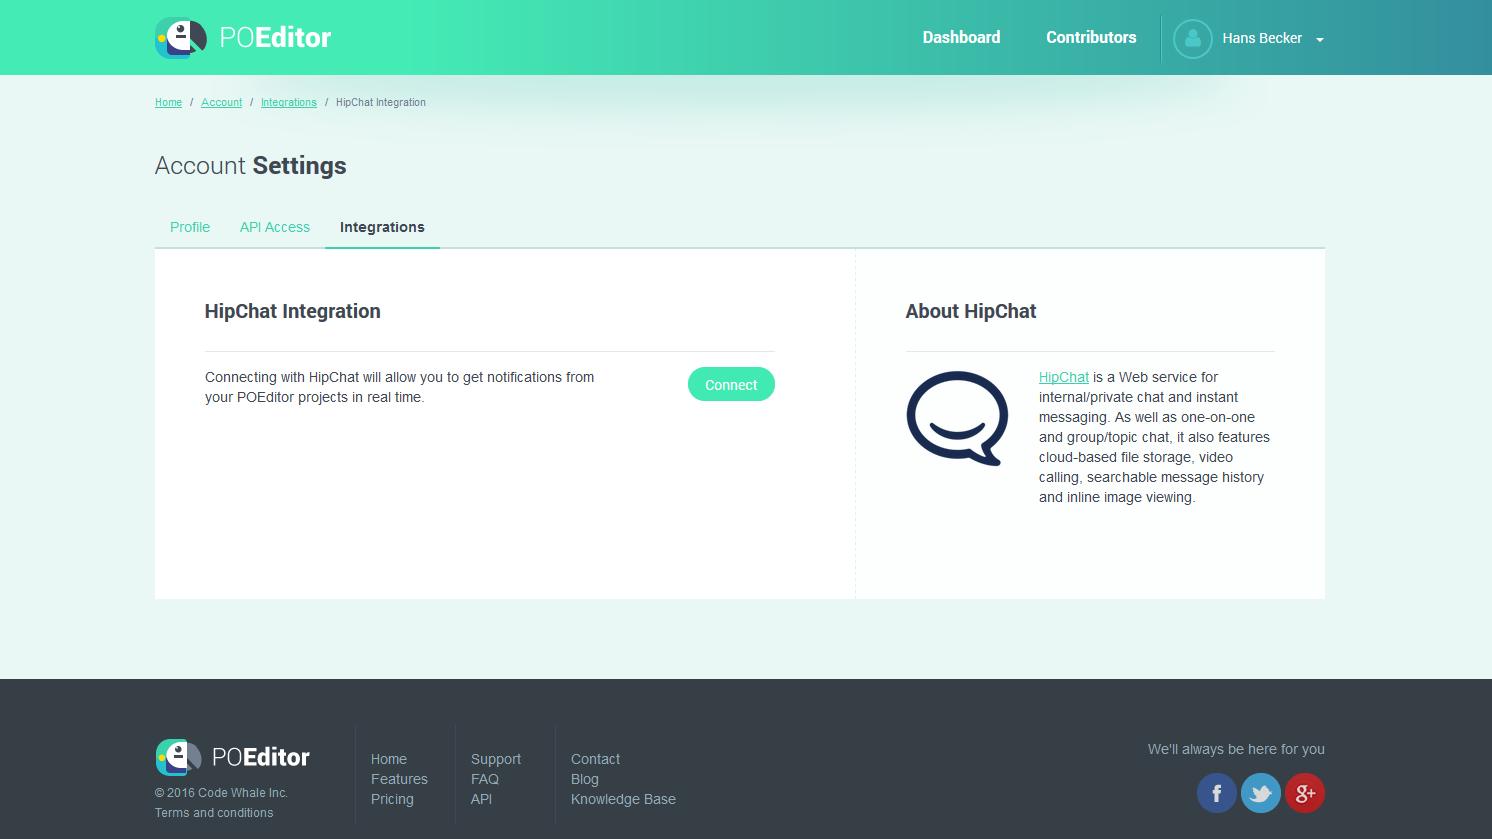 HipChat Integration Page - POEditor Localization Platform